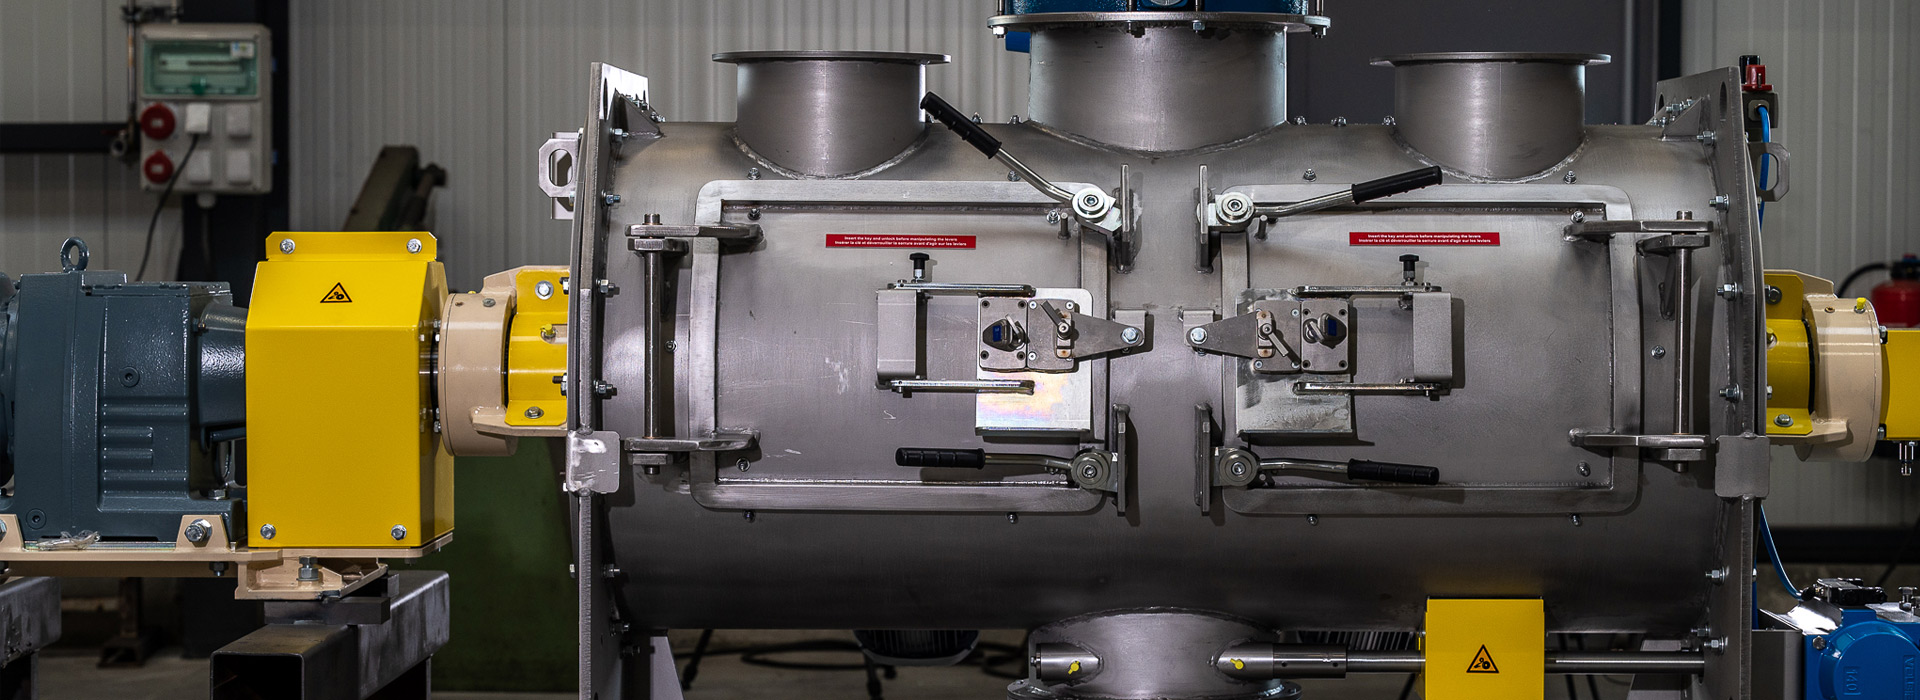 Sofraden, Fabricant de mélangeurs industriels